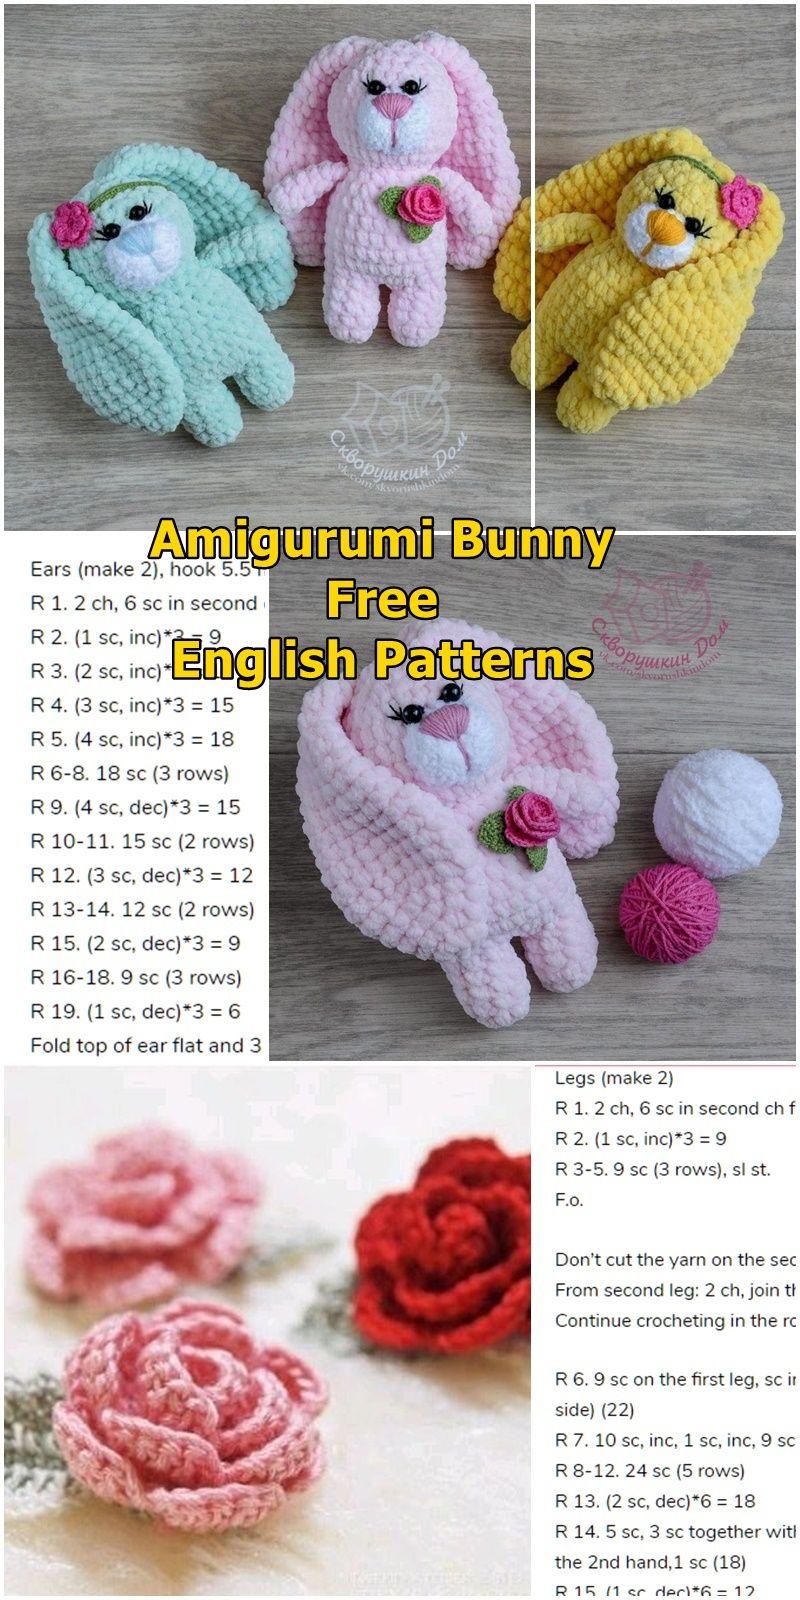 Amigurumi Plush Bunny With Rose Free Crochet Pattern - Amigurumi Crochet #eastercrochetpatterns